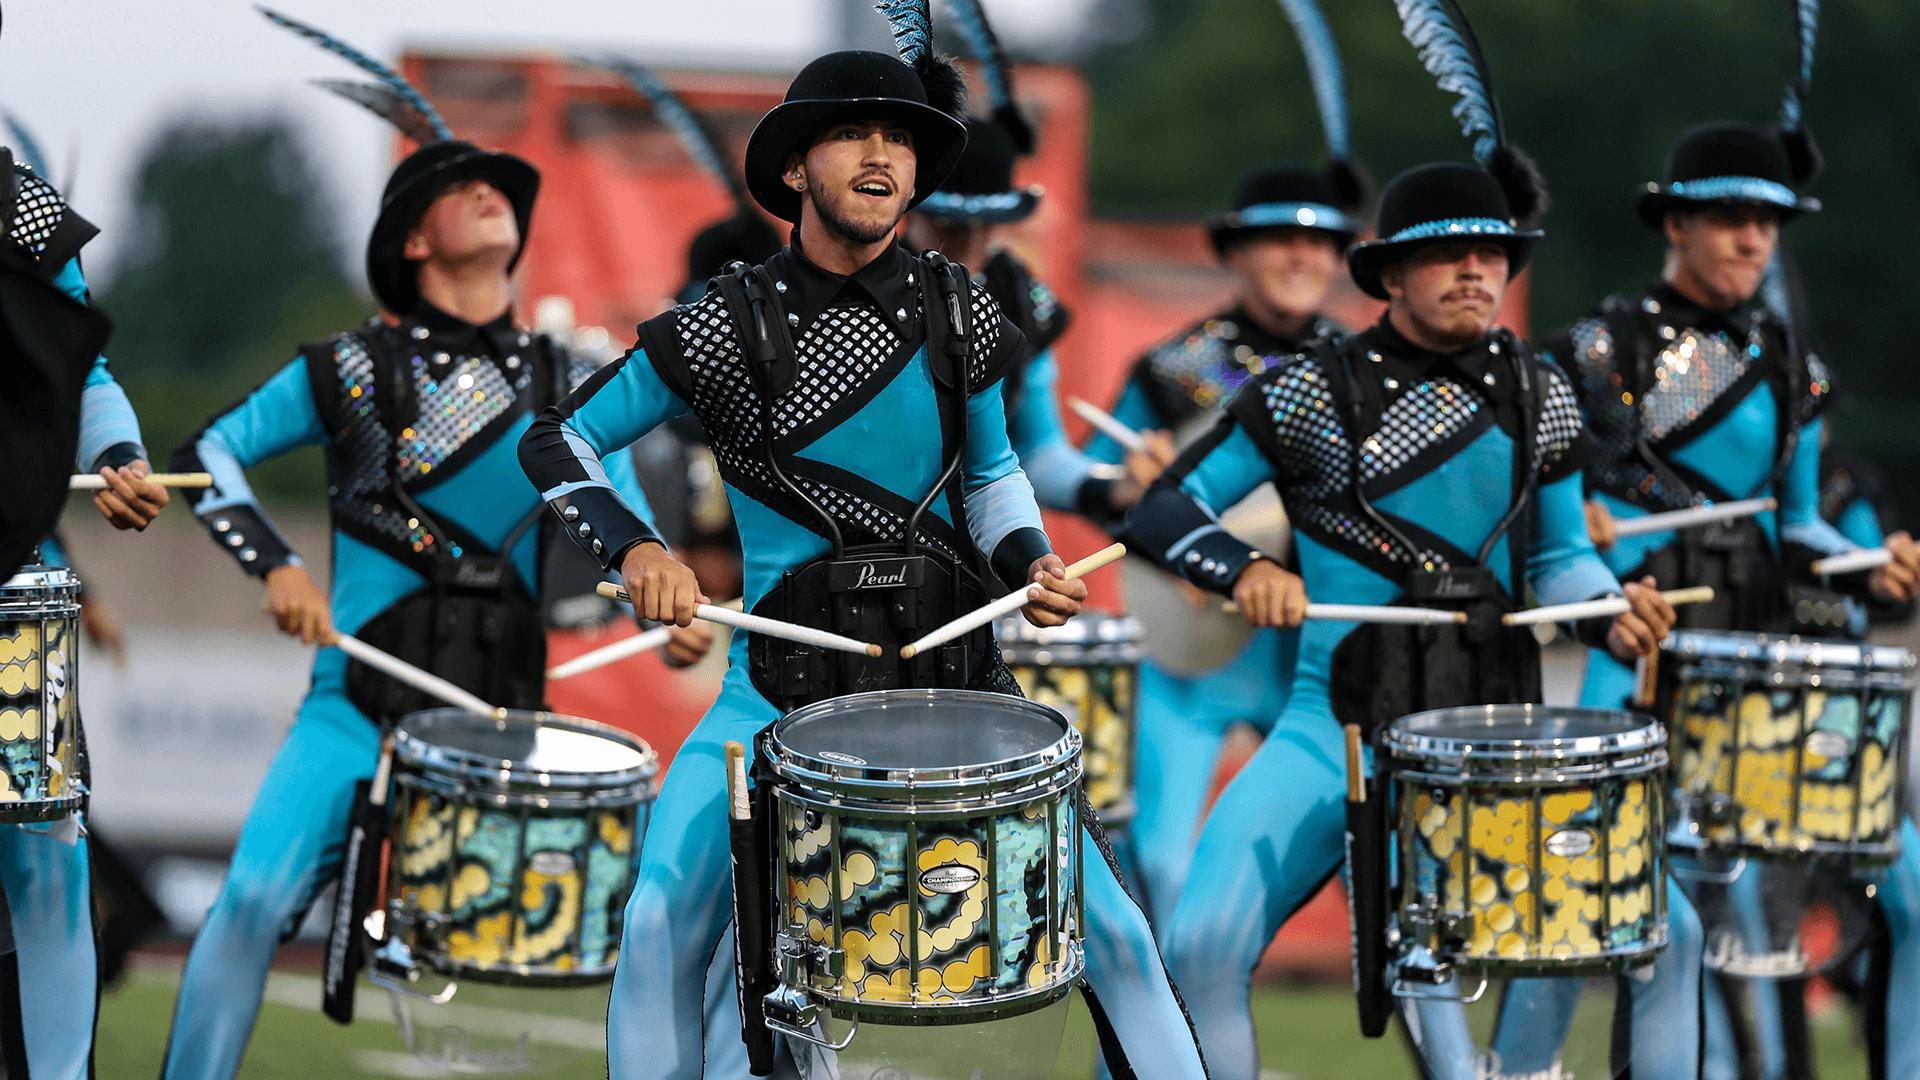 Drums Across America - Valdosta